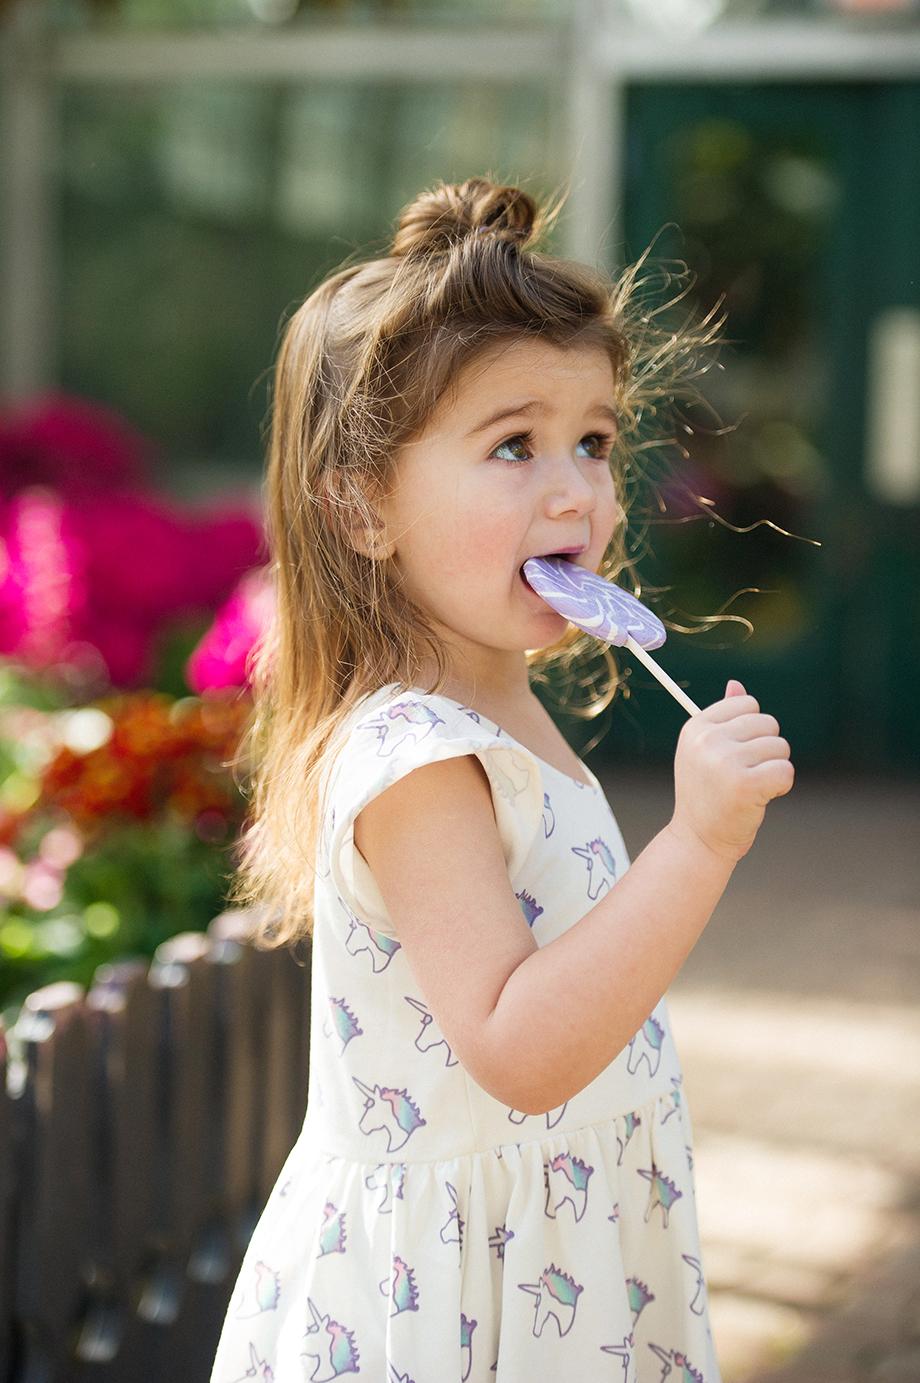 A toddler eating a purple swirl sucker in a unicorn print dress.